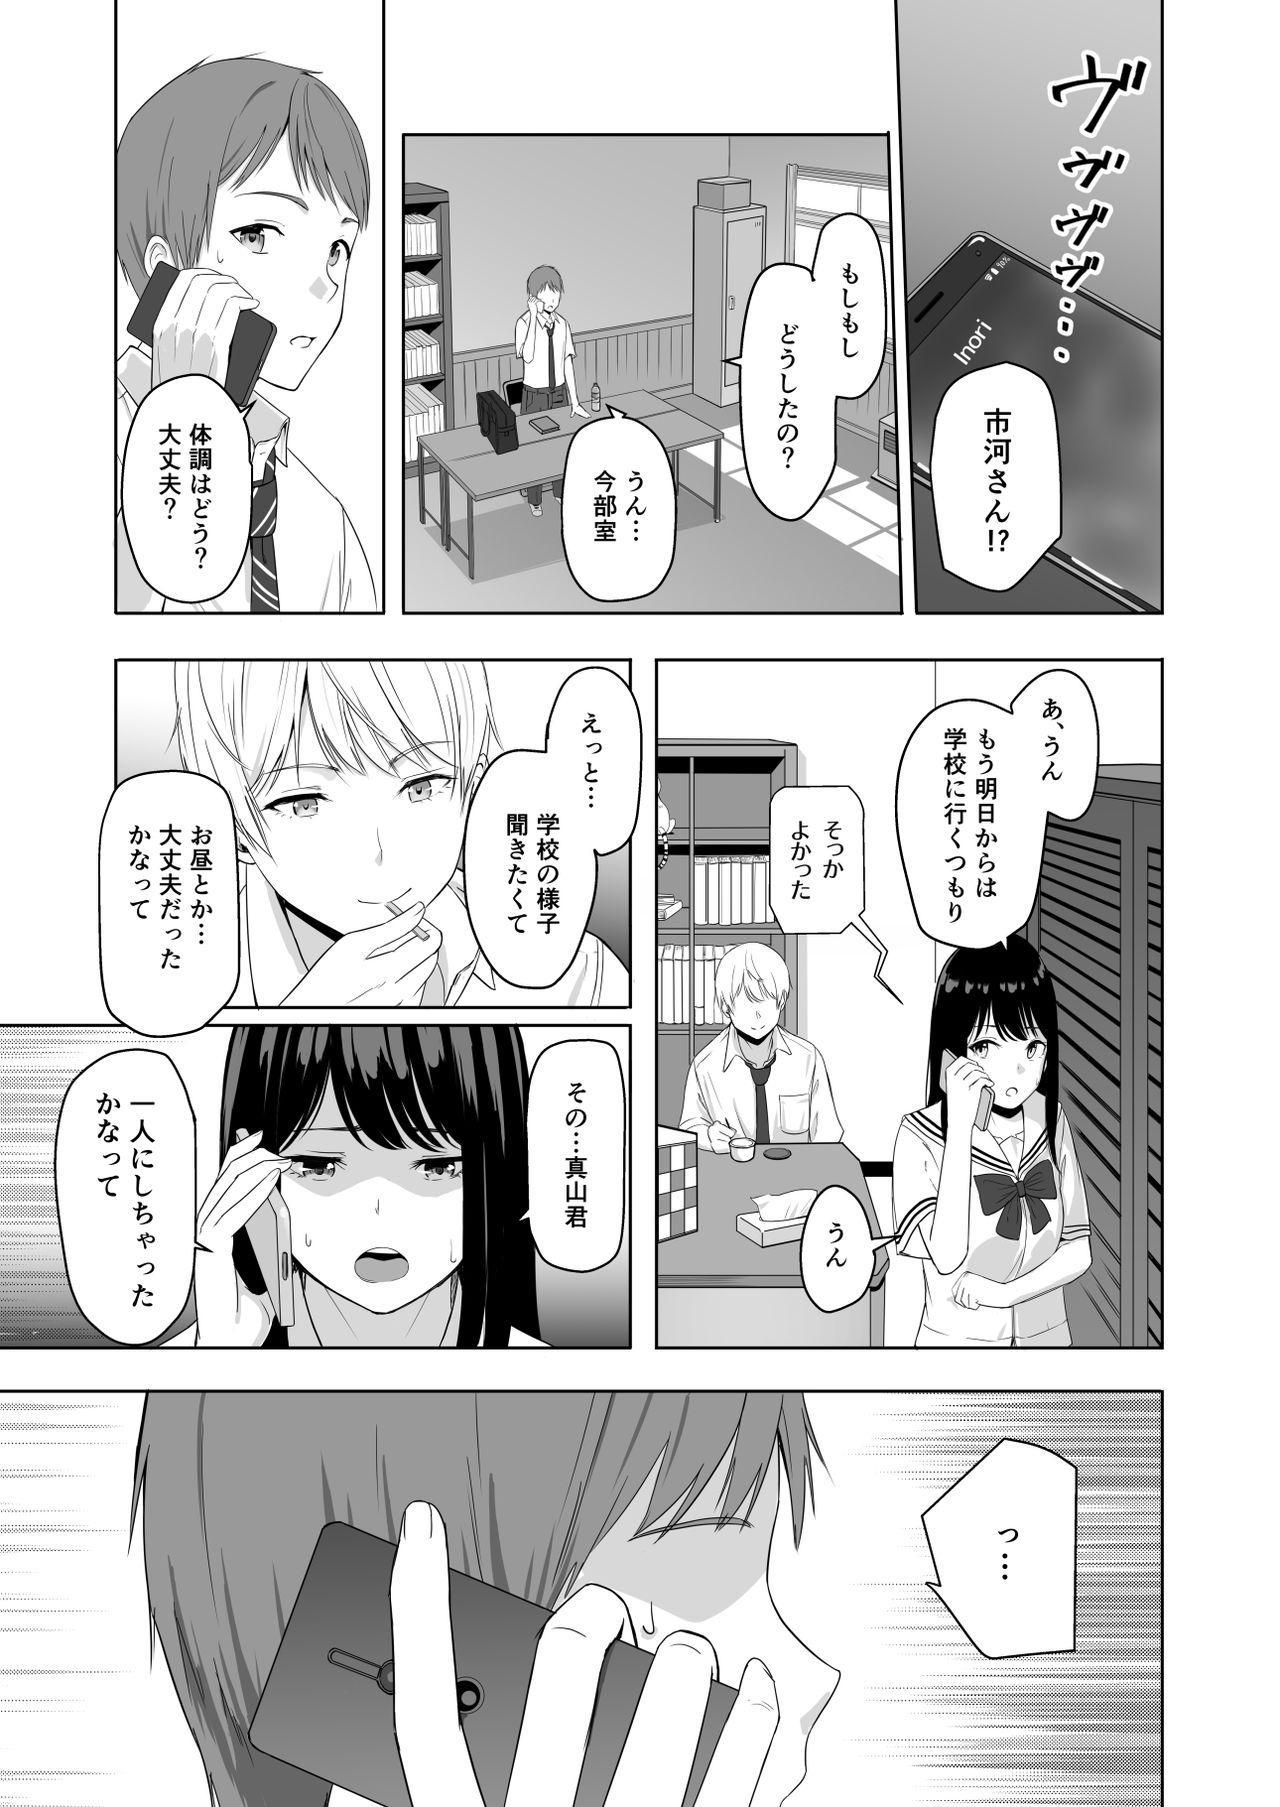 Kimi ga Tame. 2 Ichikawa Inori 43